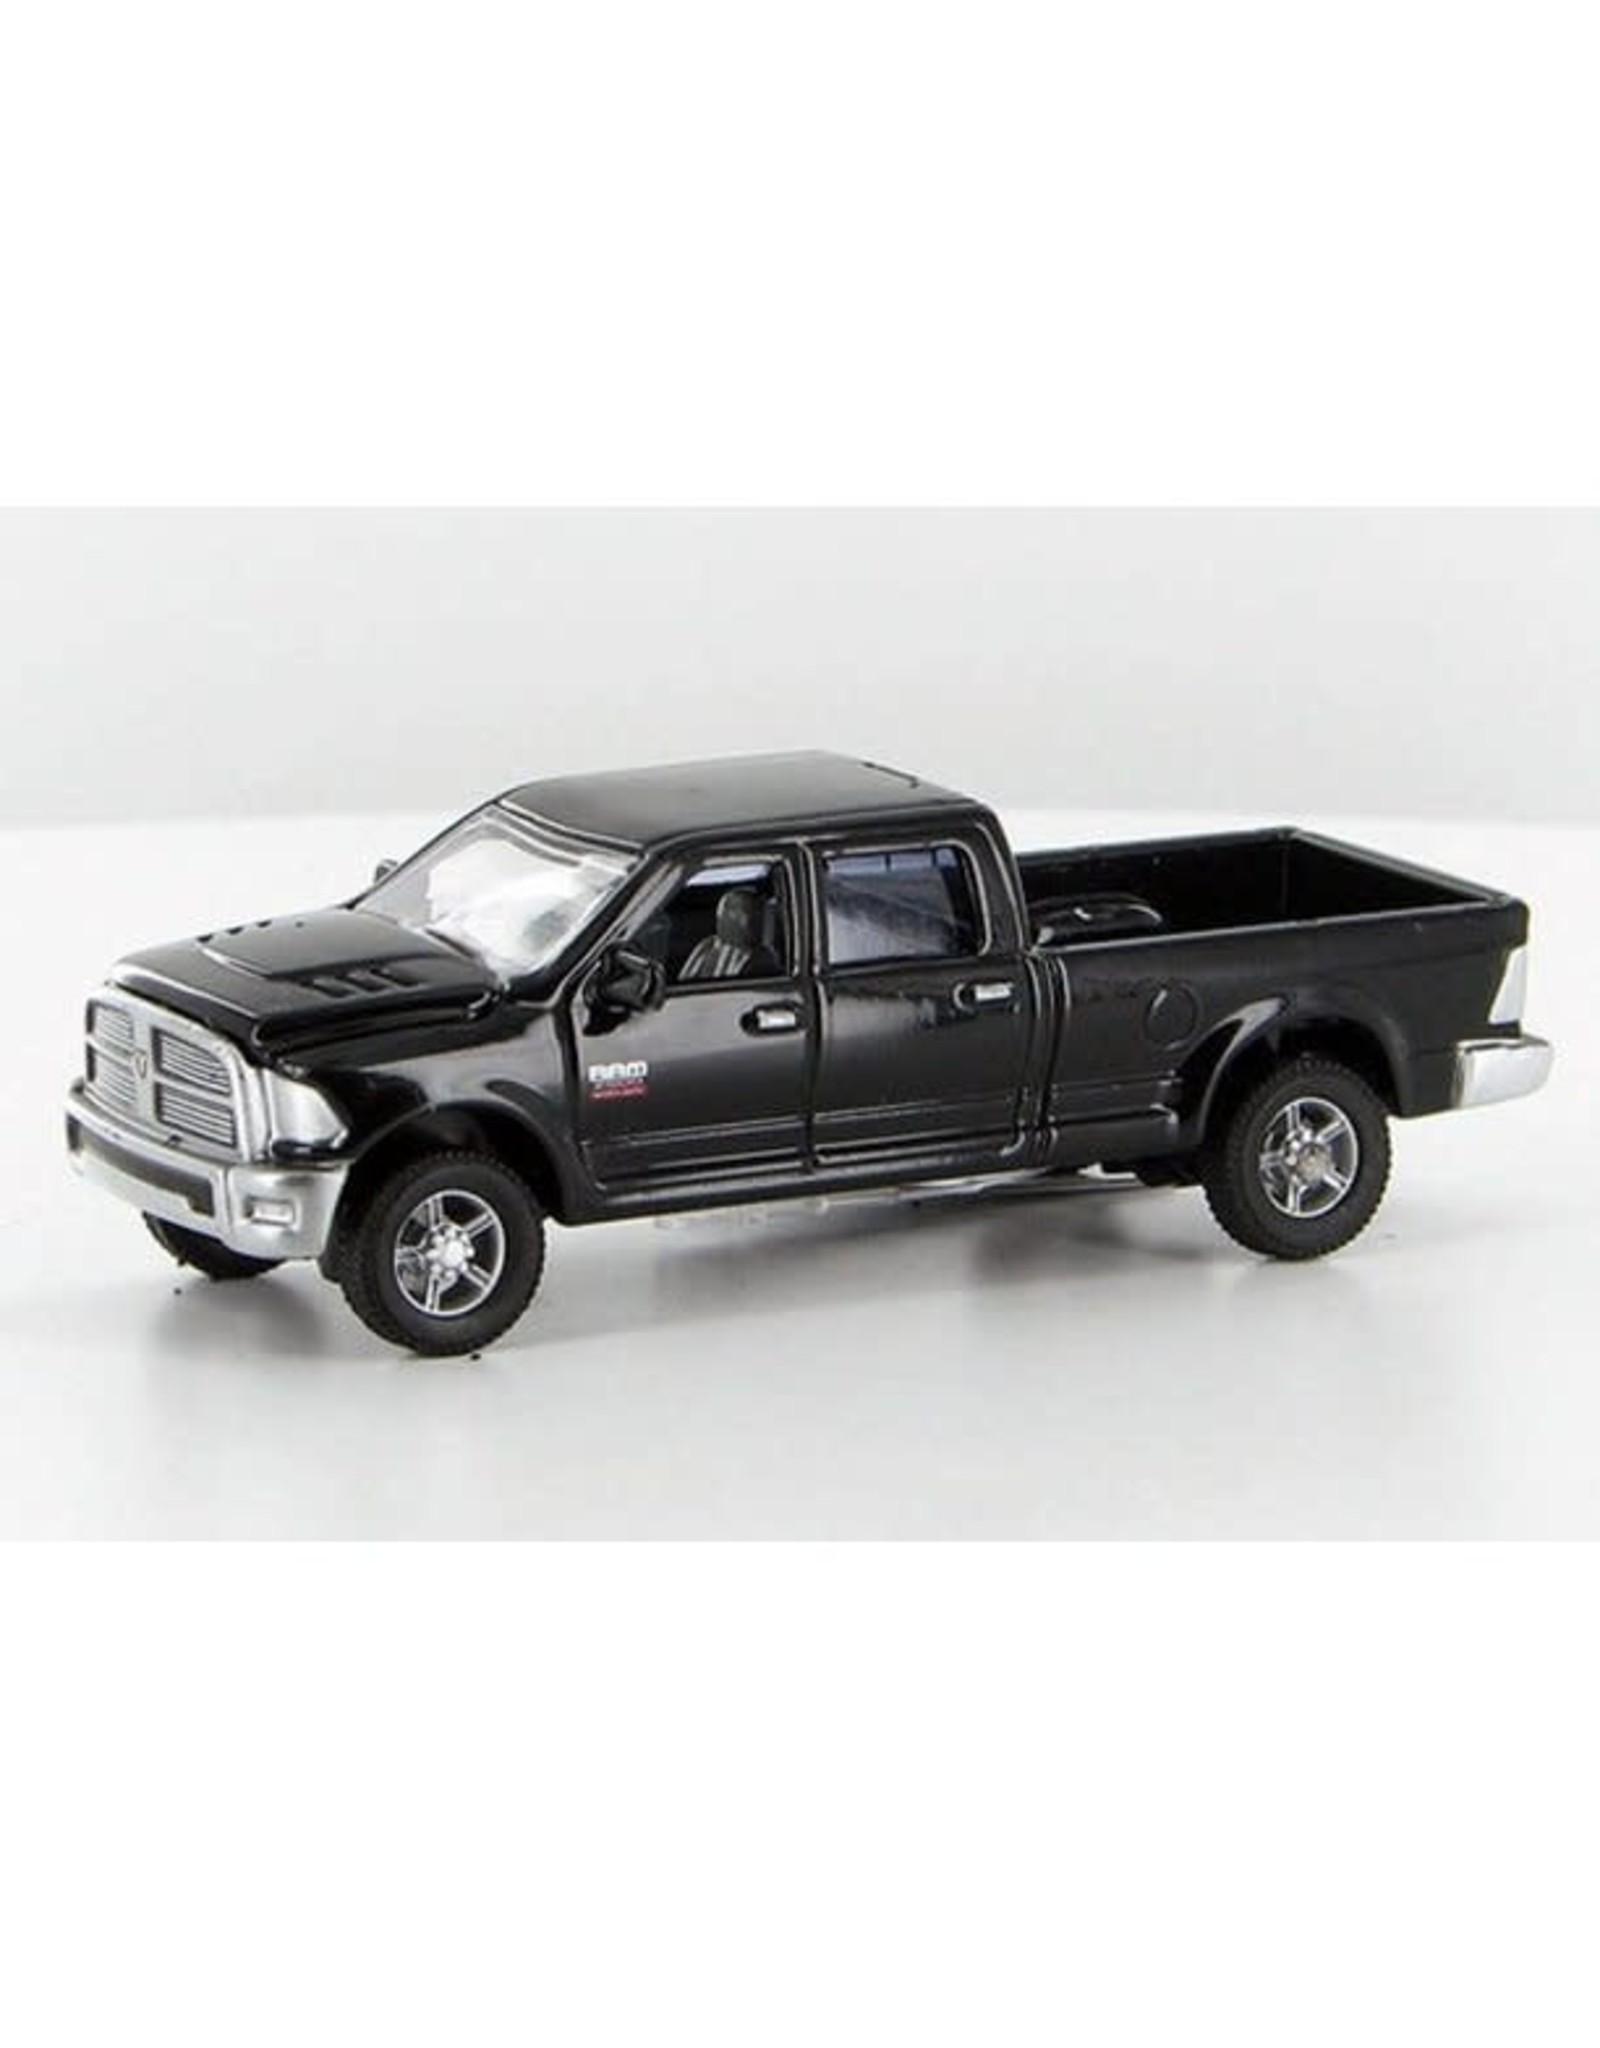 1:64 2012 Ram 2500 Pickup